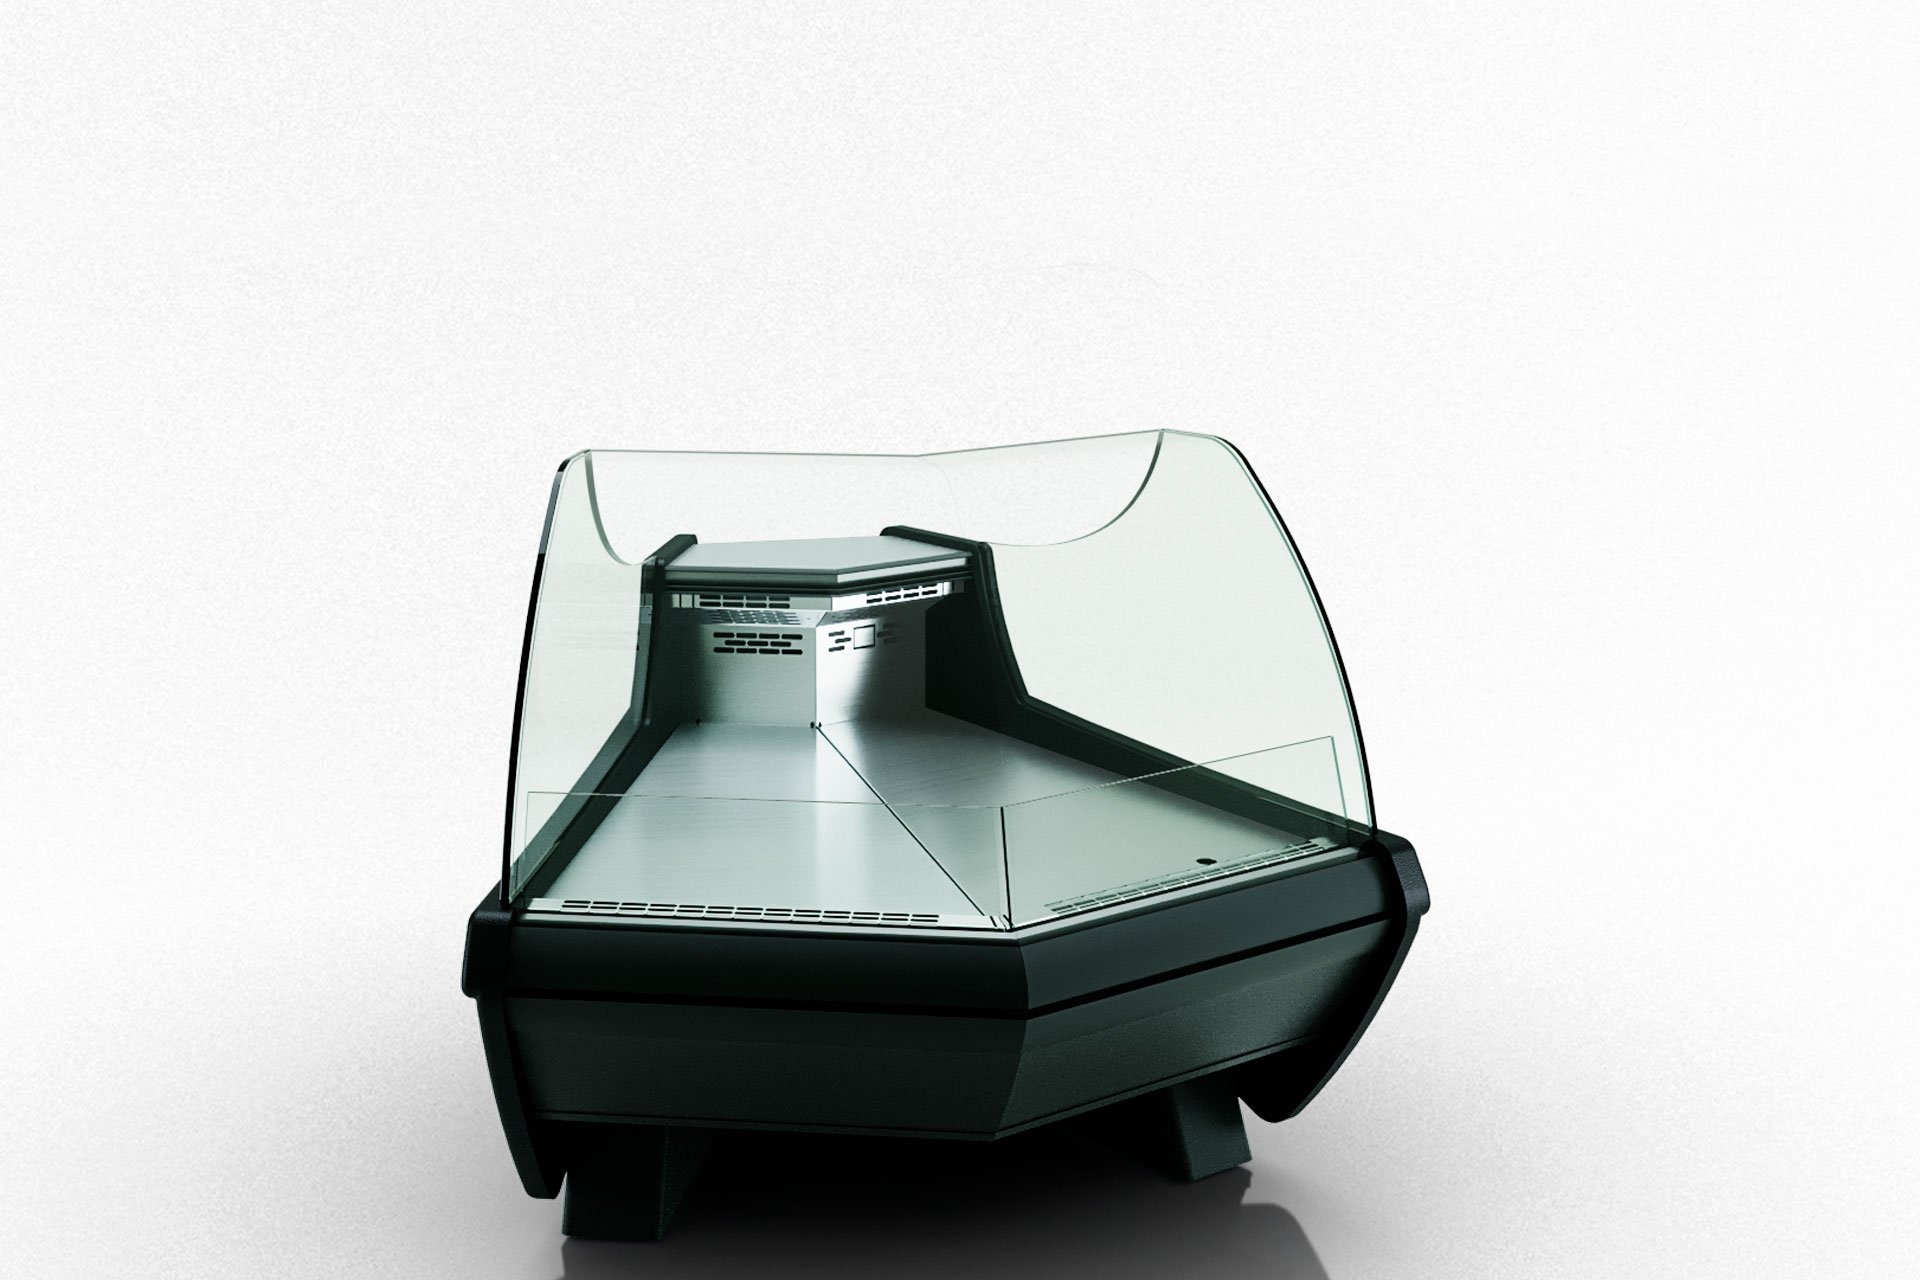 Counter Symphony luxe MG 120 deli T 110-DLM-ES45